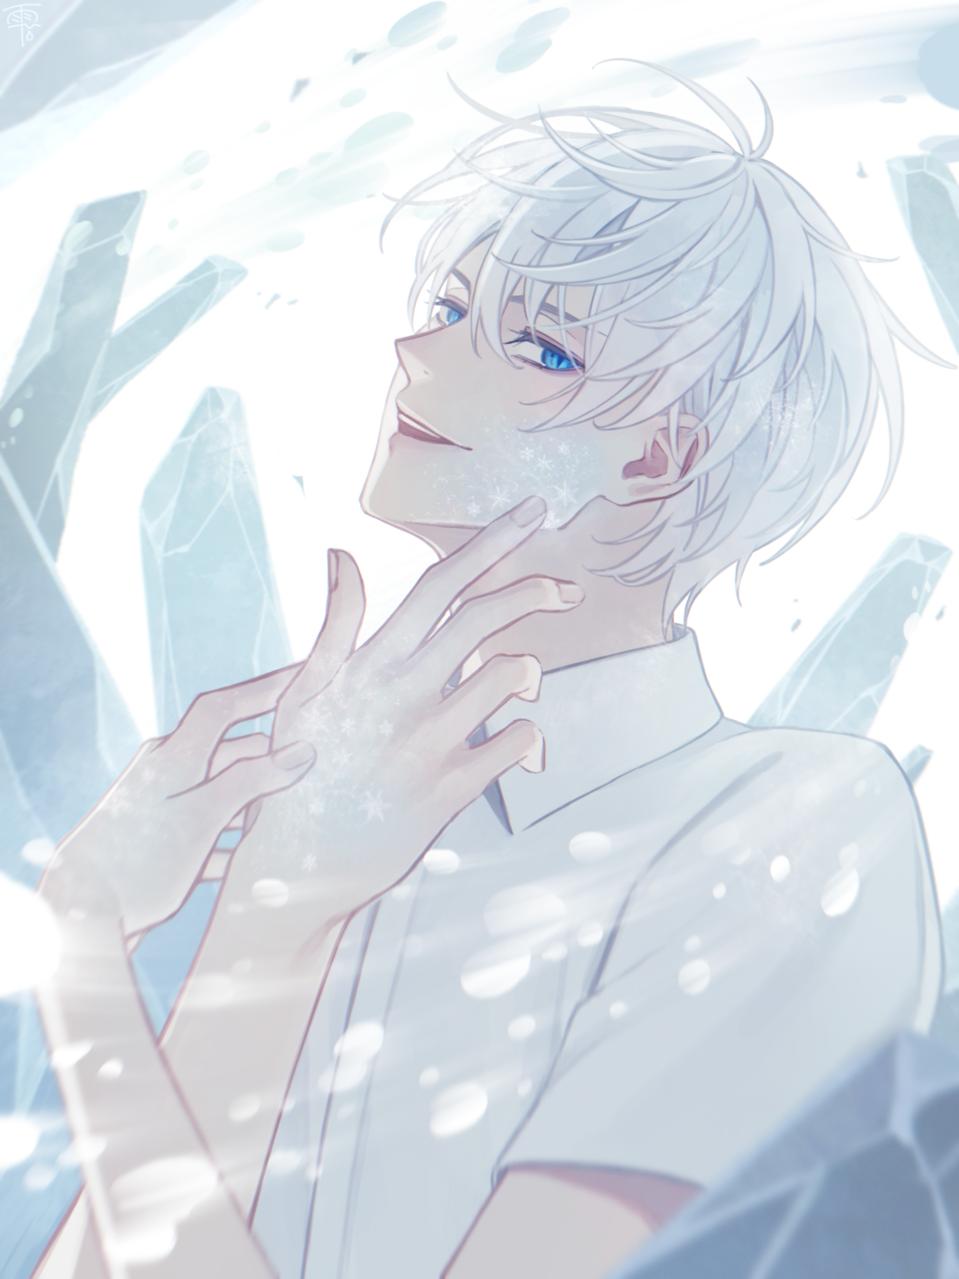 ❄️ Illust of 雨色 雫 sideface boy original white_hair ice